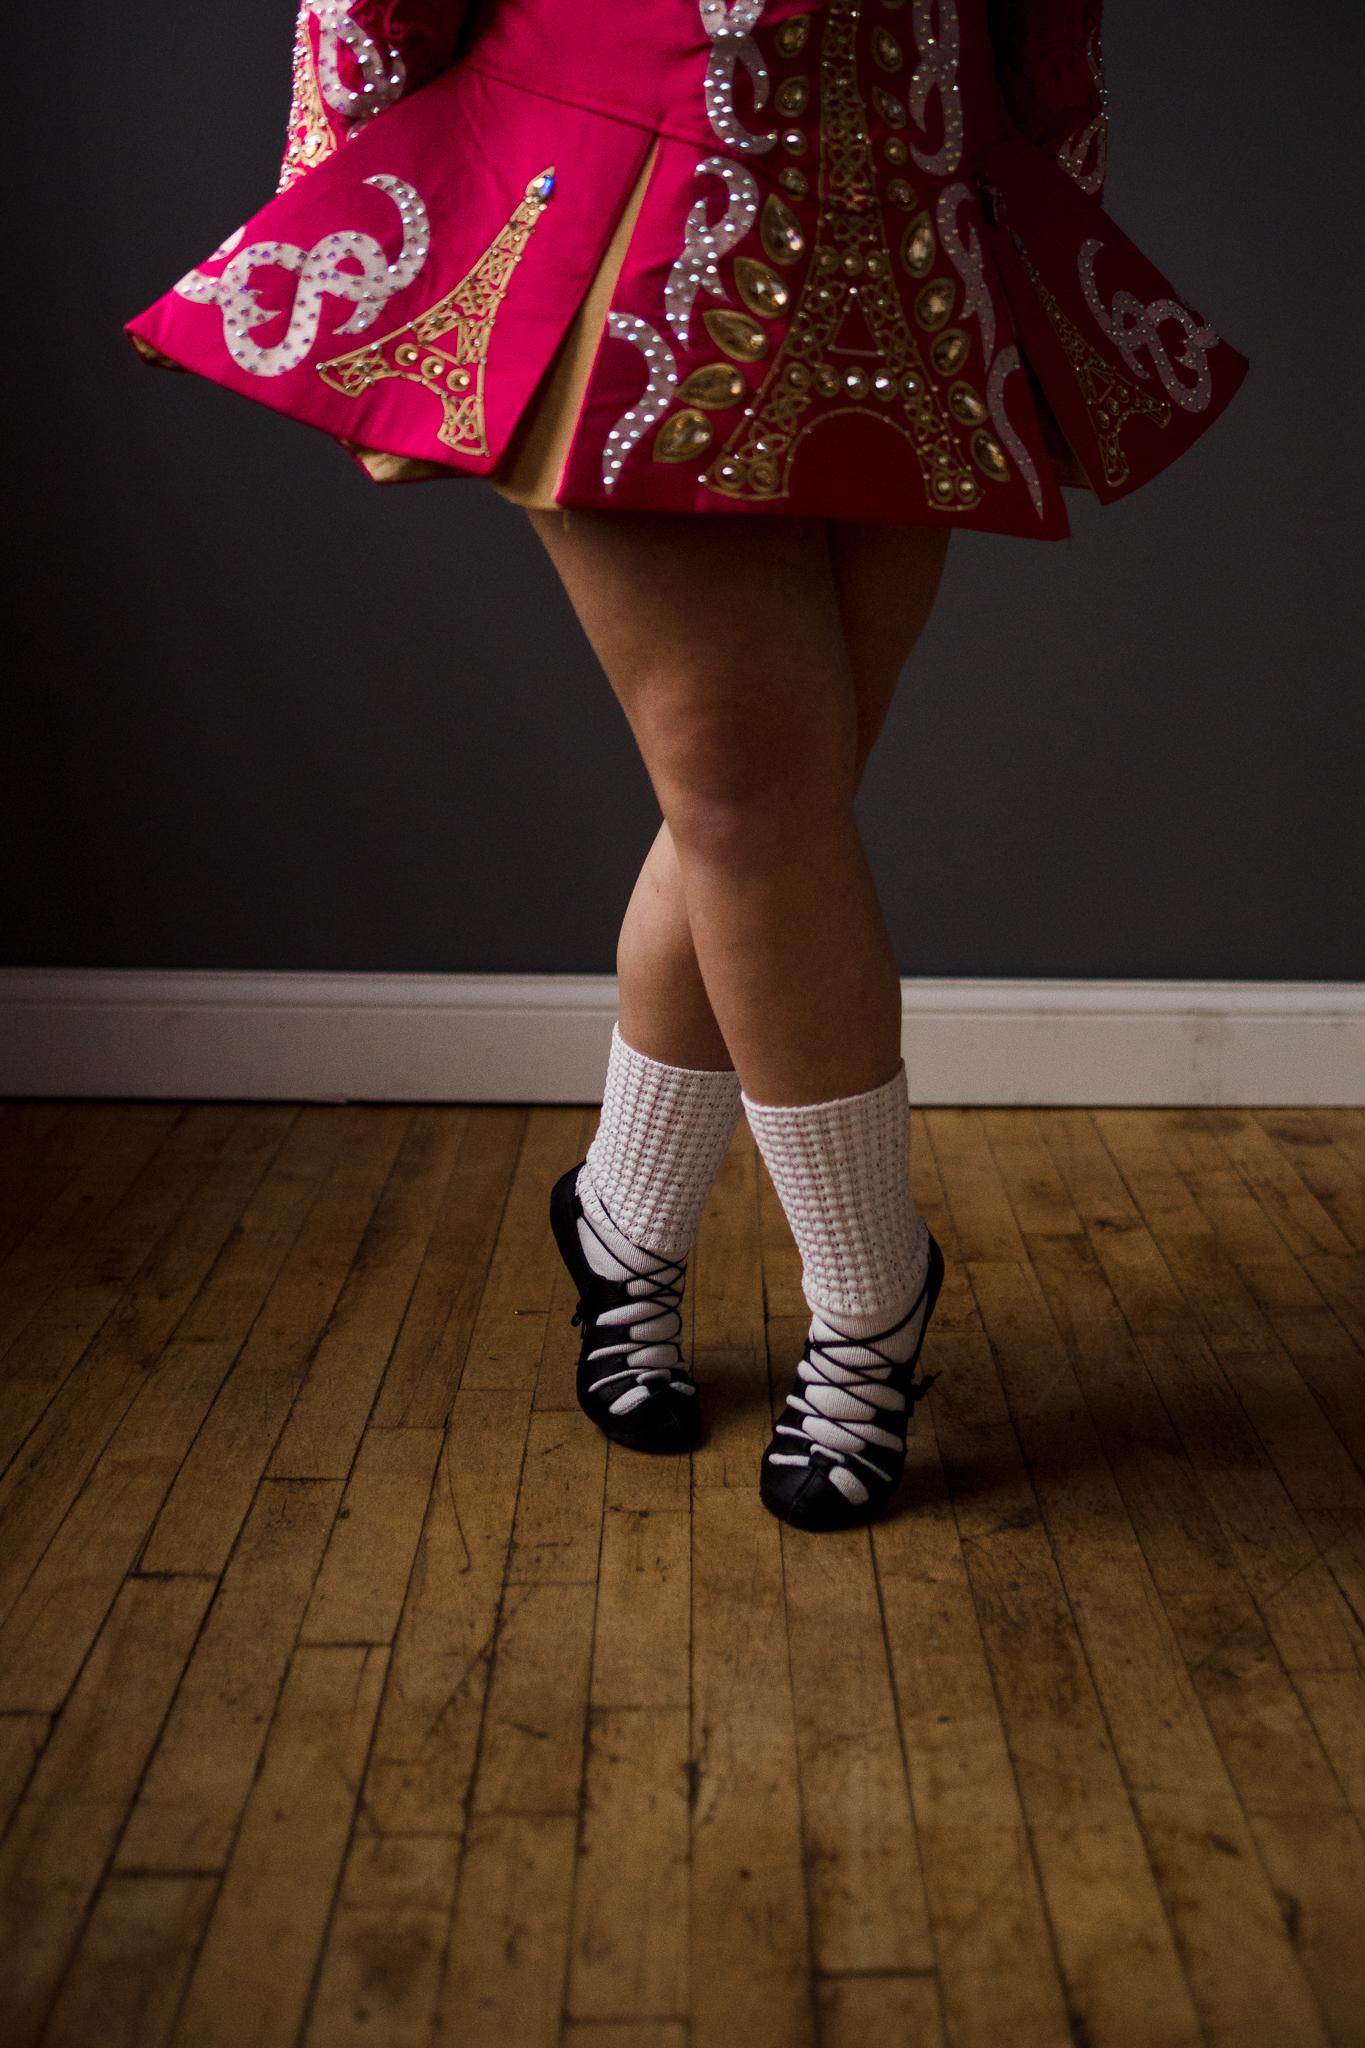 dark pink Irish Dance dress with white socks and black shoes - Wayzata Lifestyle Family Photographer